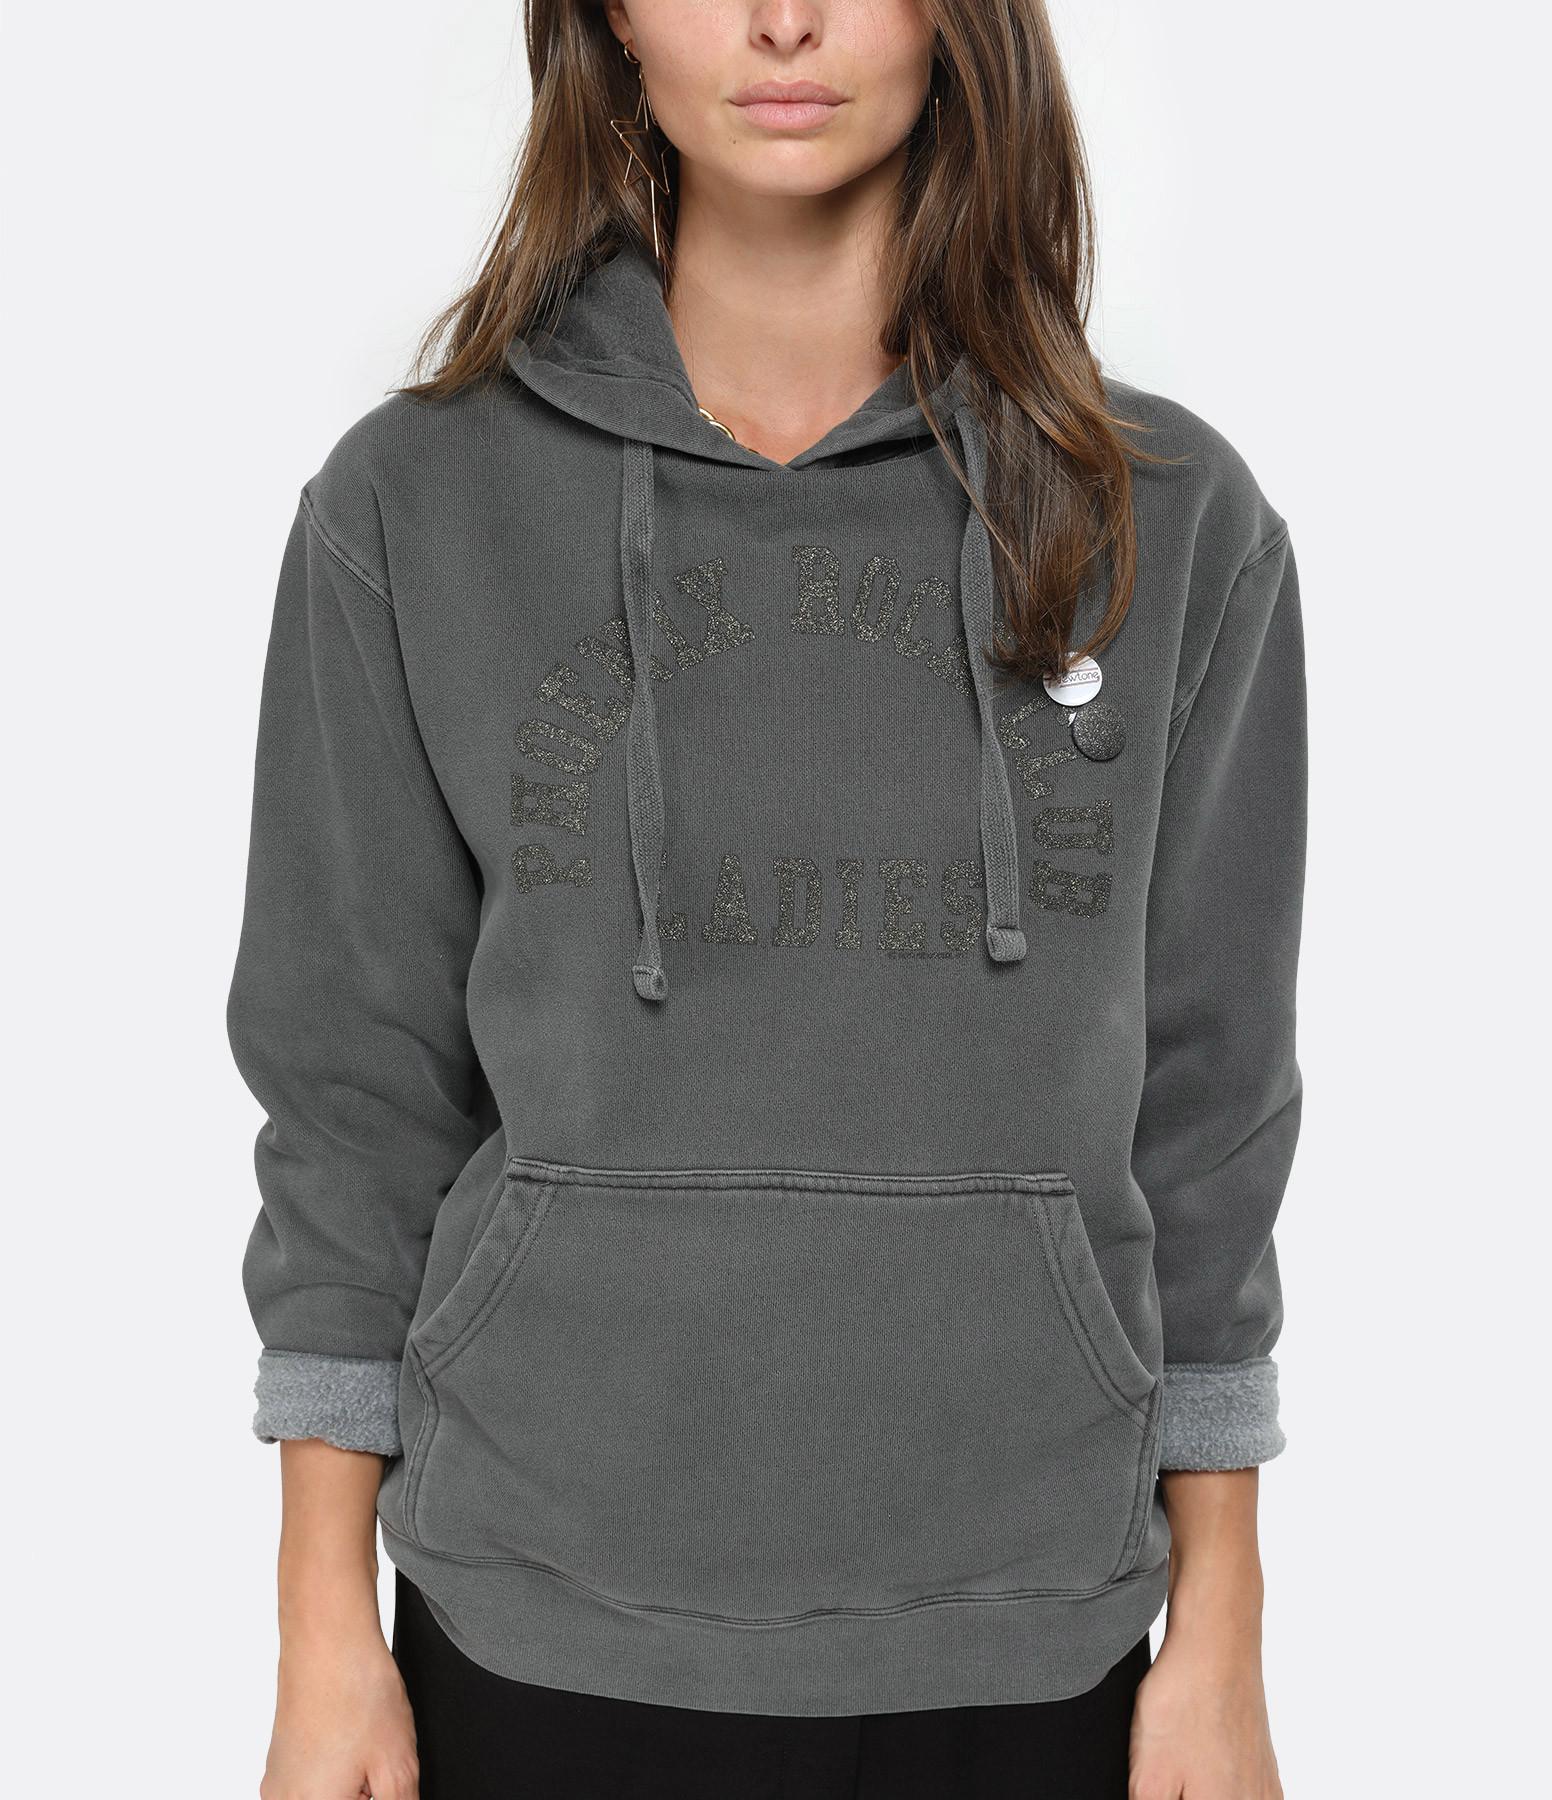 NEWTONE - Sweatshirt Hoody Phoenix Coton Pepper